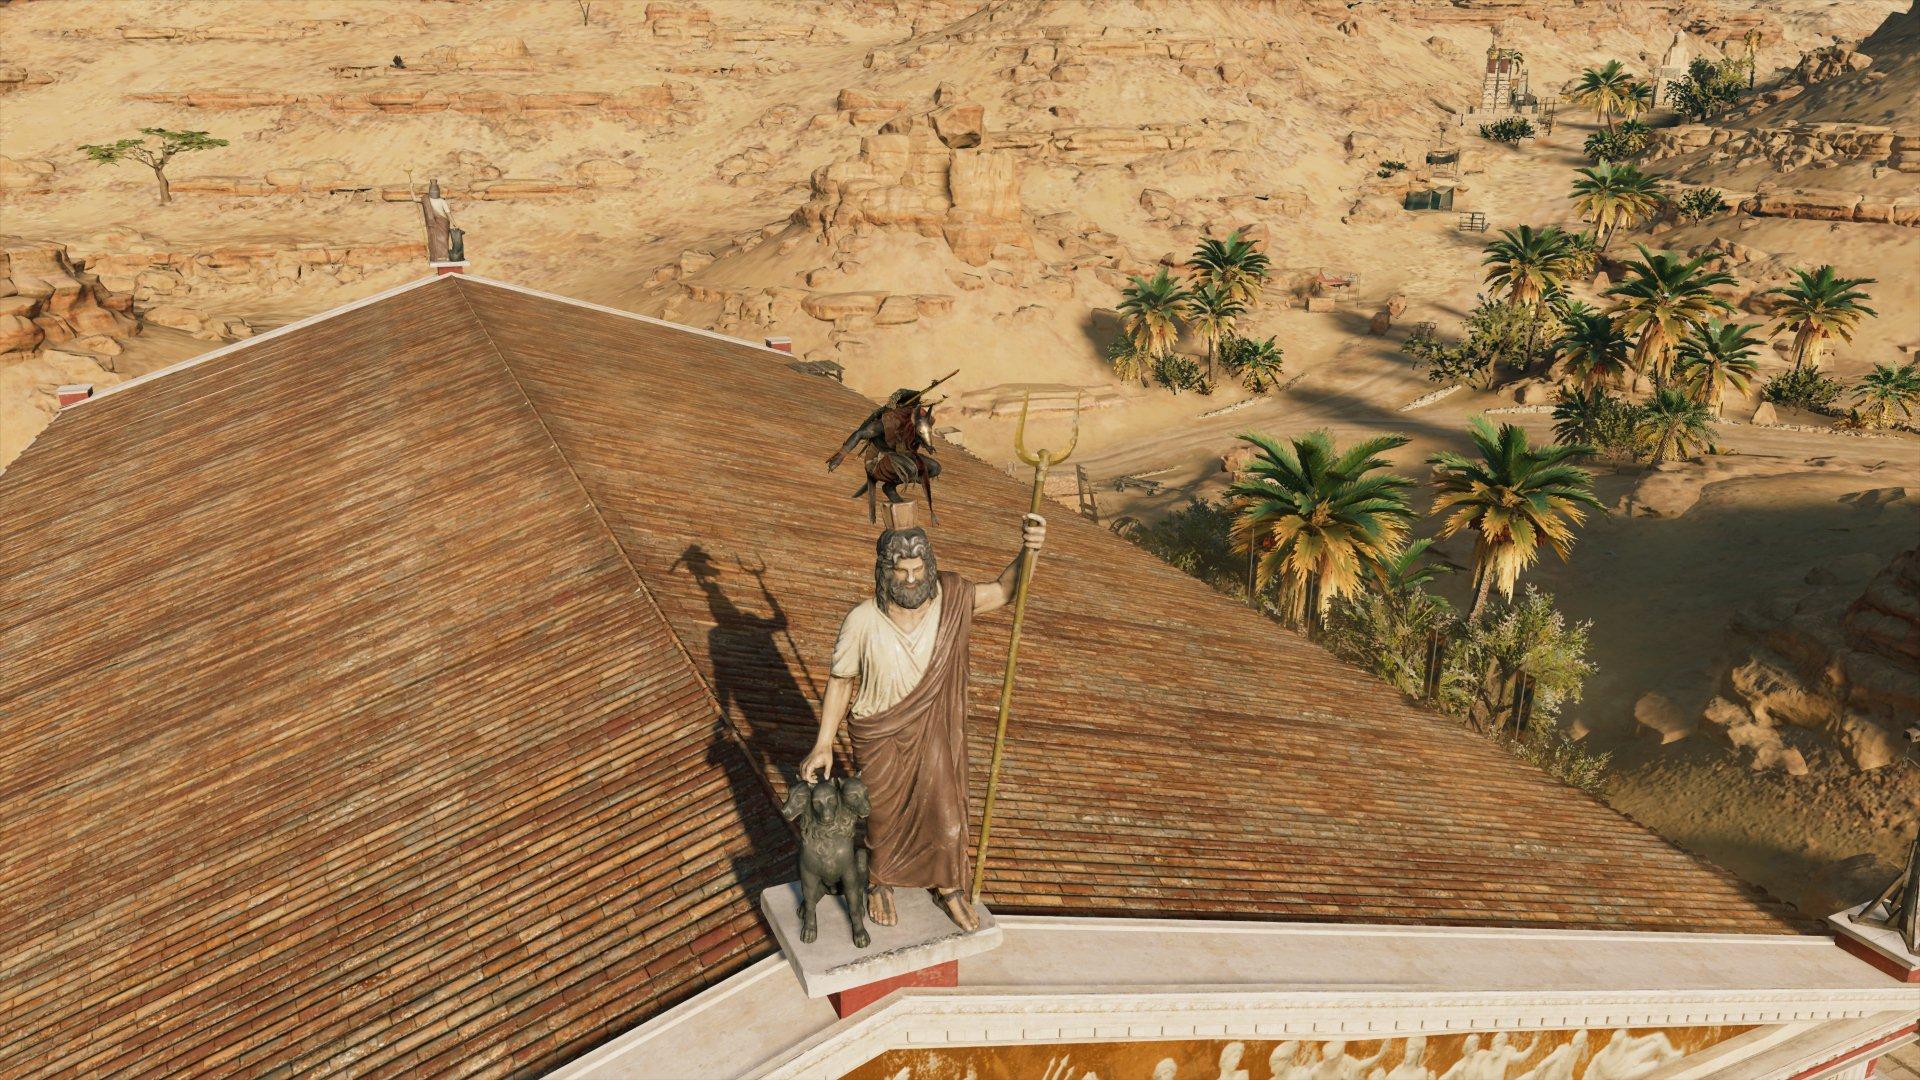 Assassin's Creed Origins - Assassin's Creed: Origins